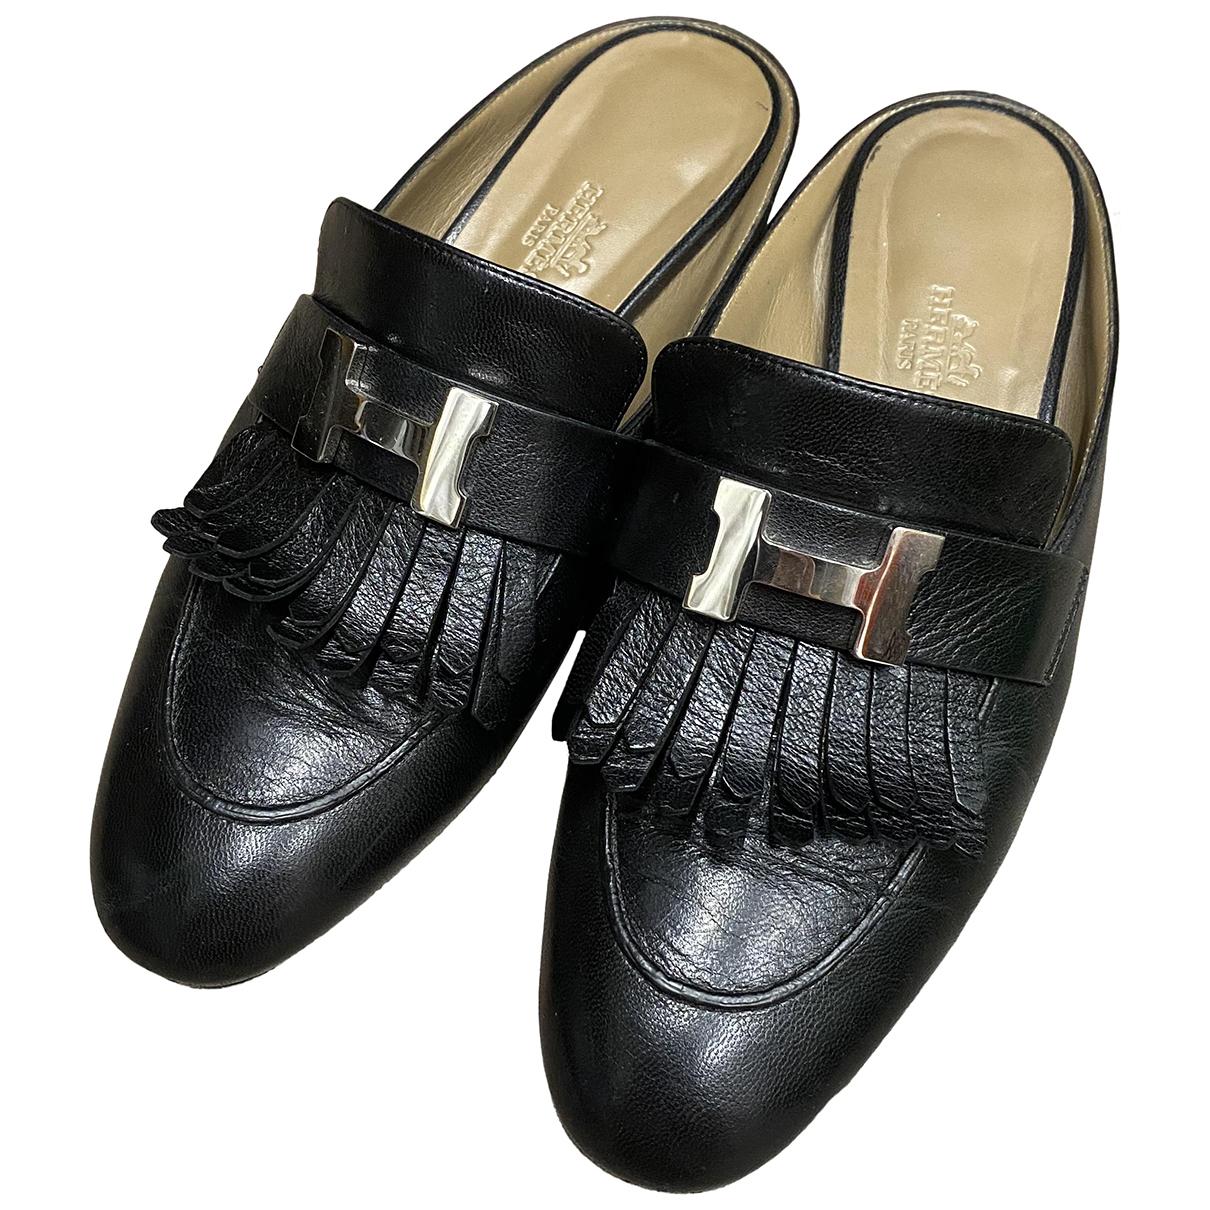 Hermès Rivoli Black Leather Sandals for Women 36.5 EU